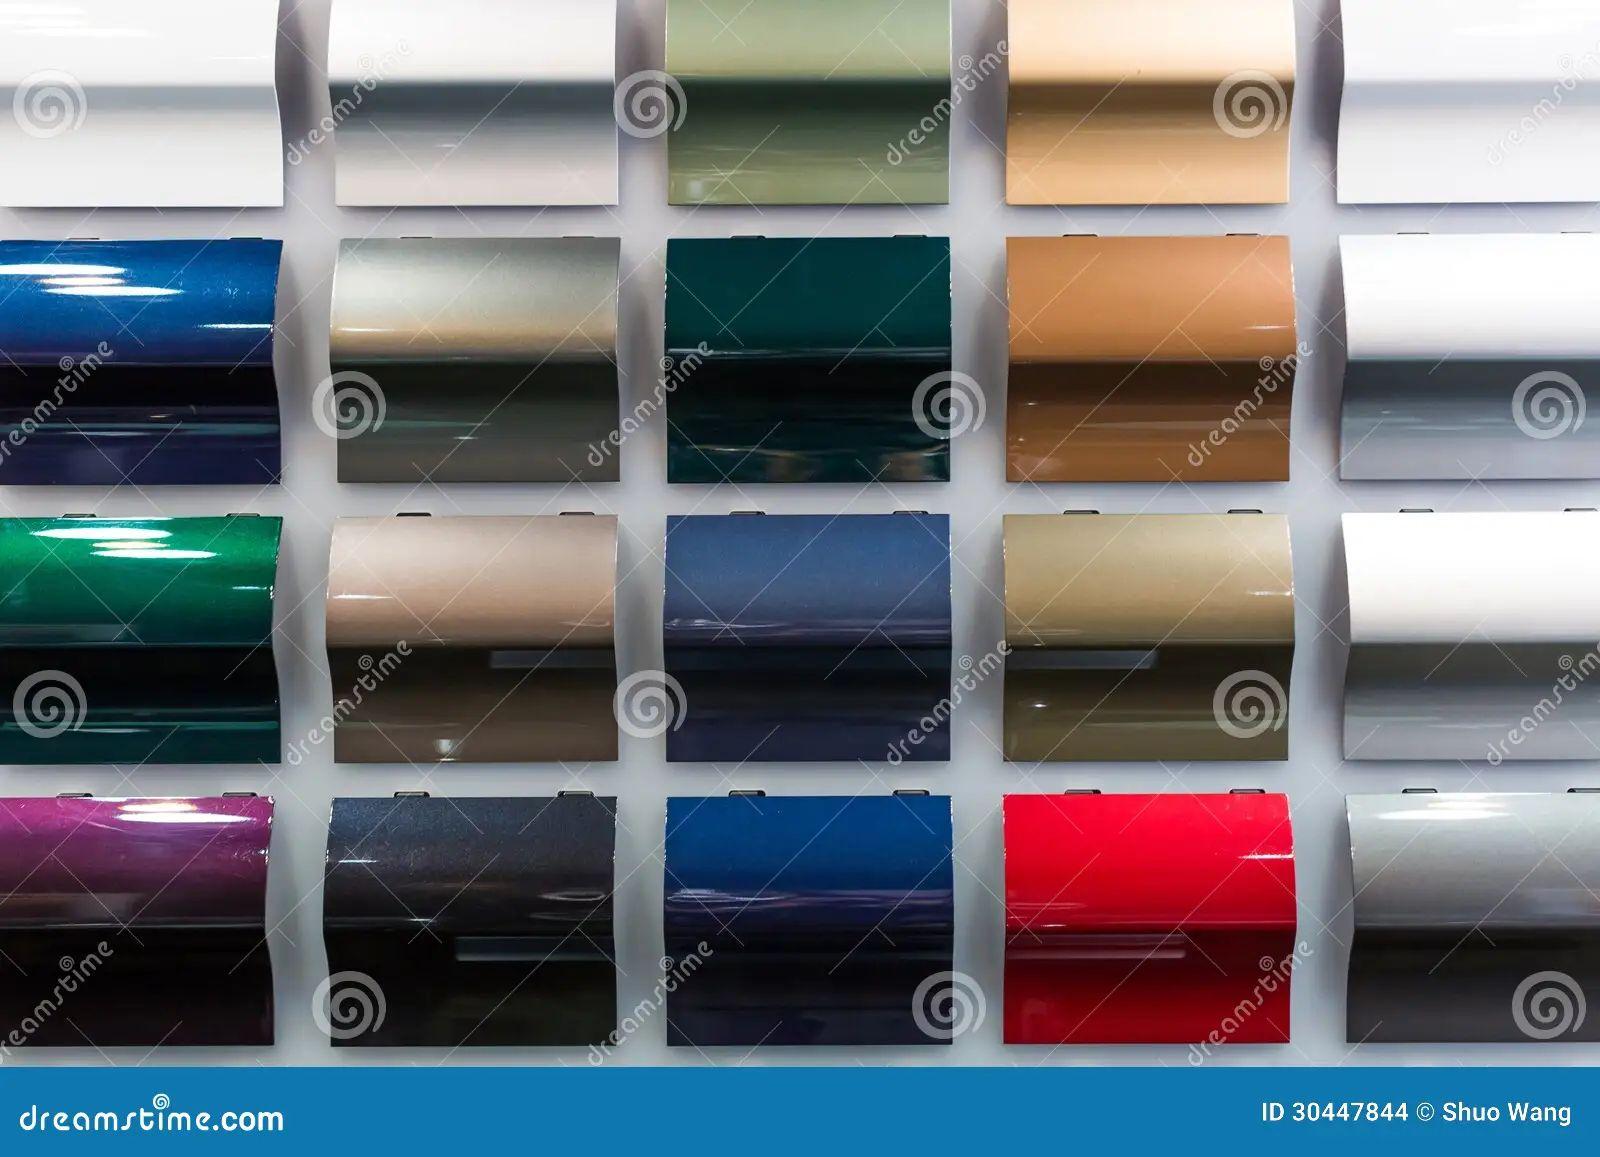 Black car paint colors chart - Dark Blue Car Paint Colors Gallery Of Car Paint Colors List